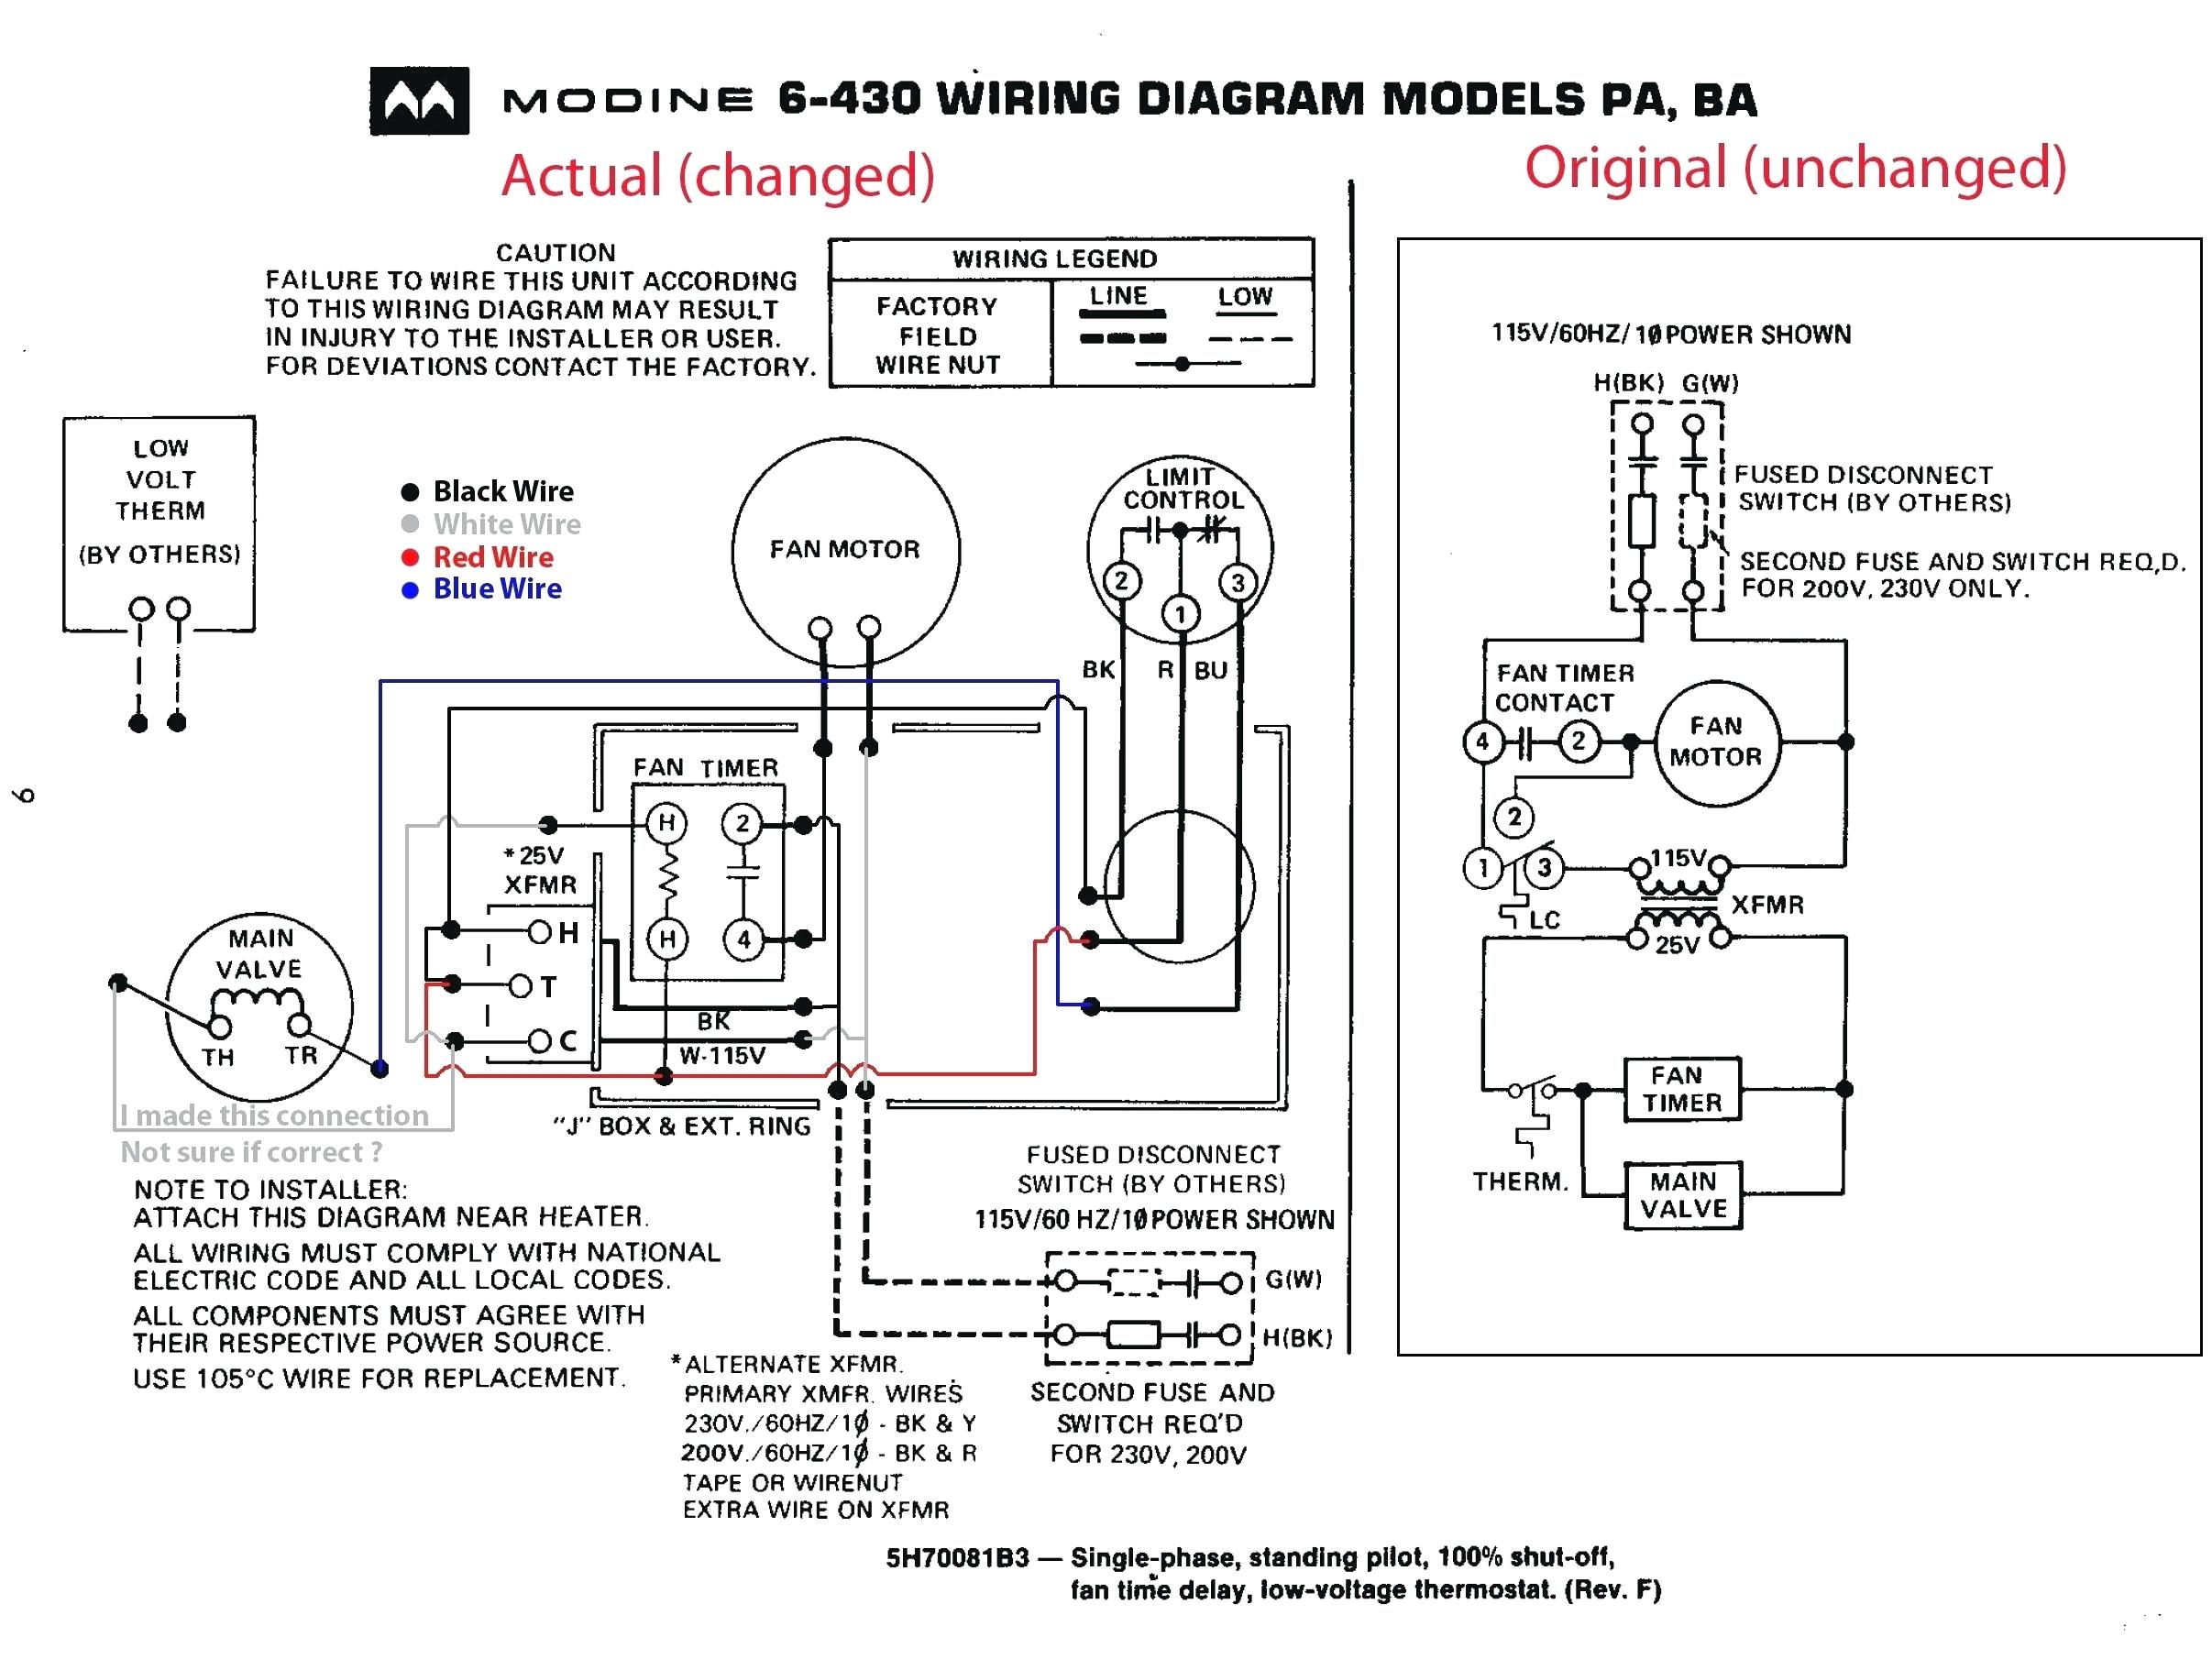 pentair booster pump wiring diagram free download wiring diagram pentair pool pump wiring diagram jpg